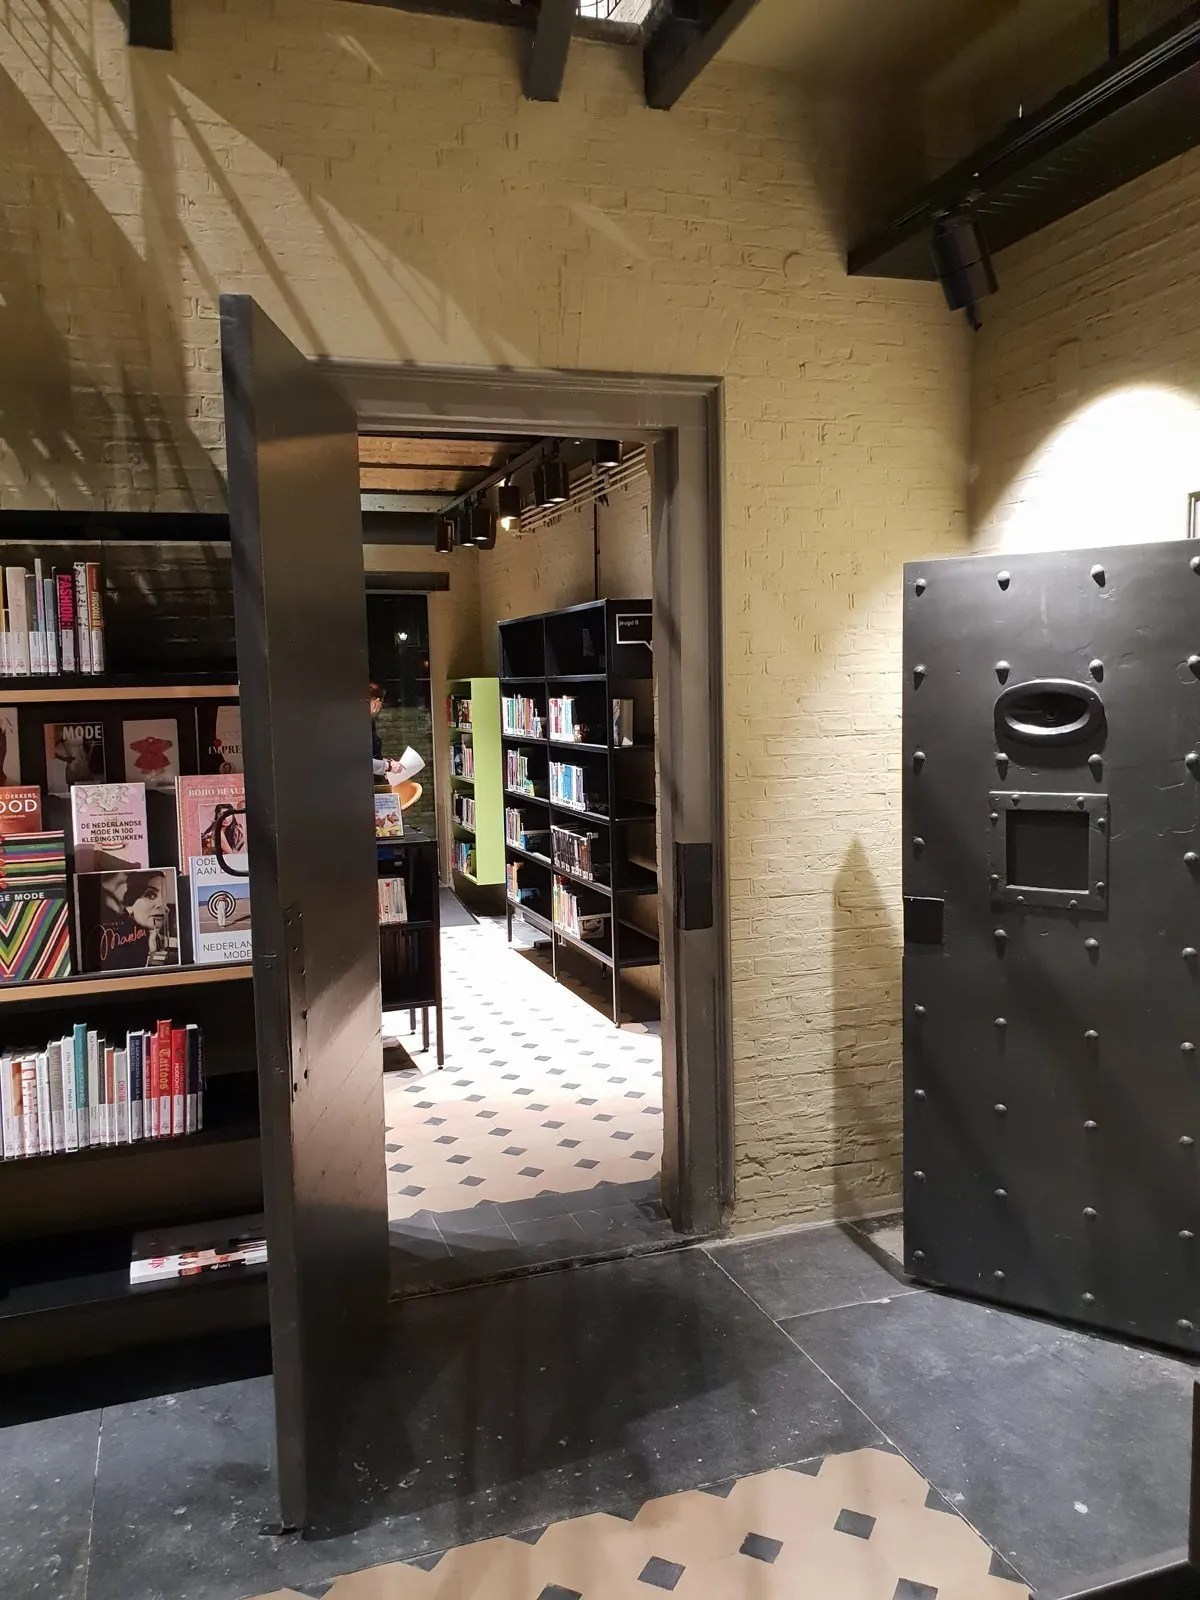 blokhuispoort Library Leeuwarden